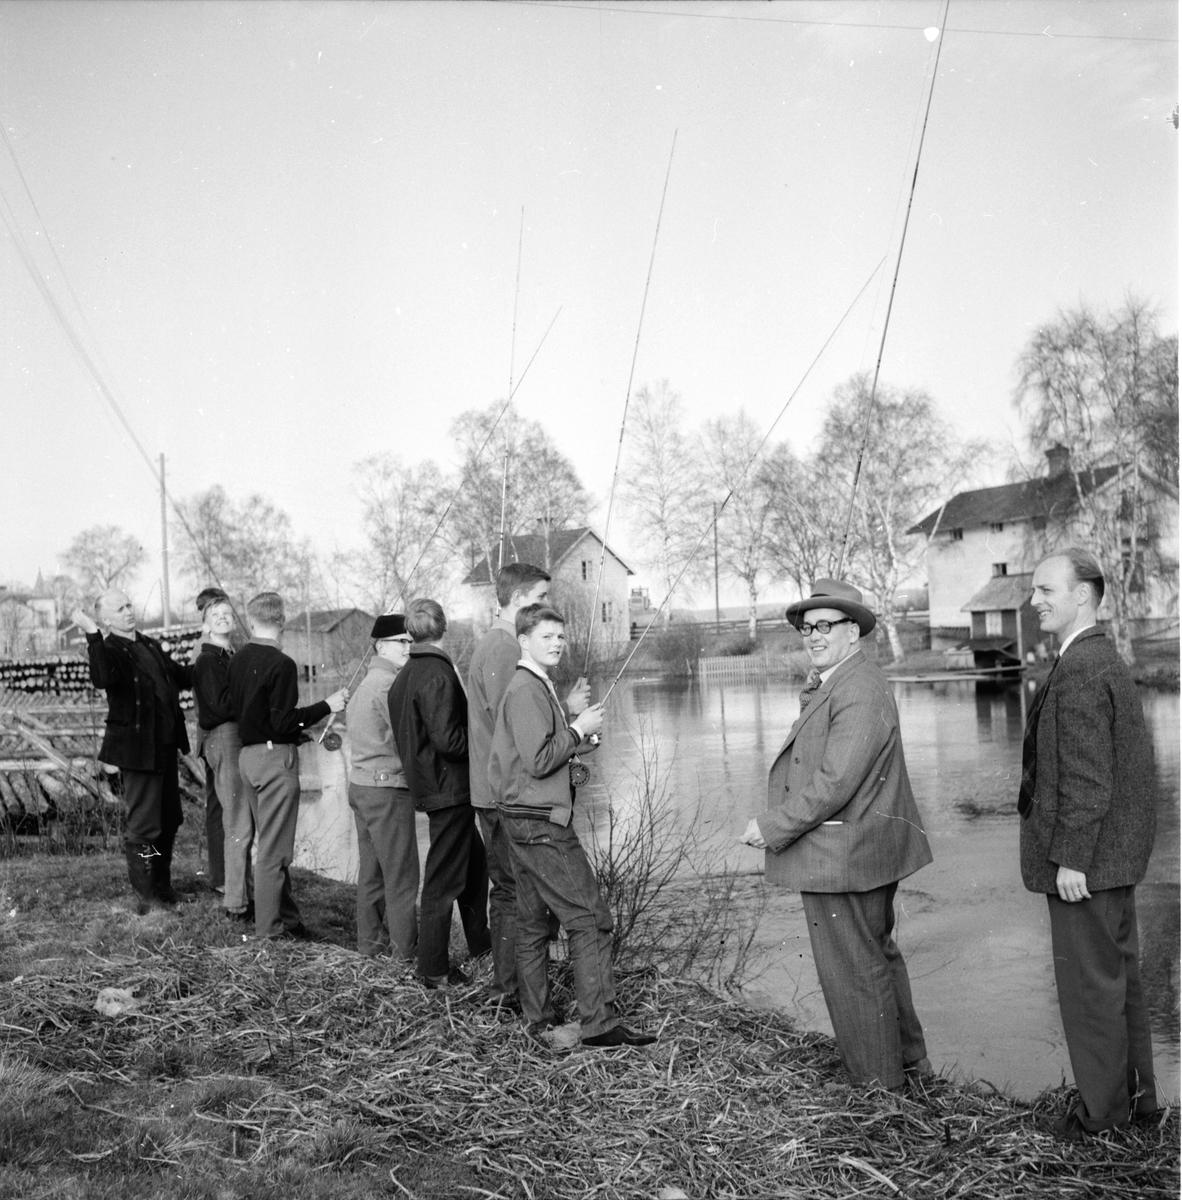 Edsbyn, Fiskeinstruktion, Weit Svensson, Mats Olofsson, Arjon, 16 Maj 1962